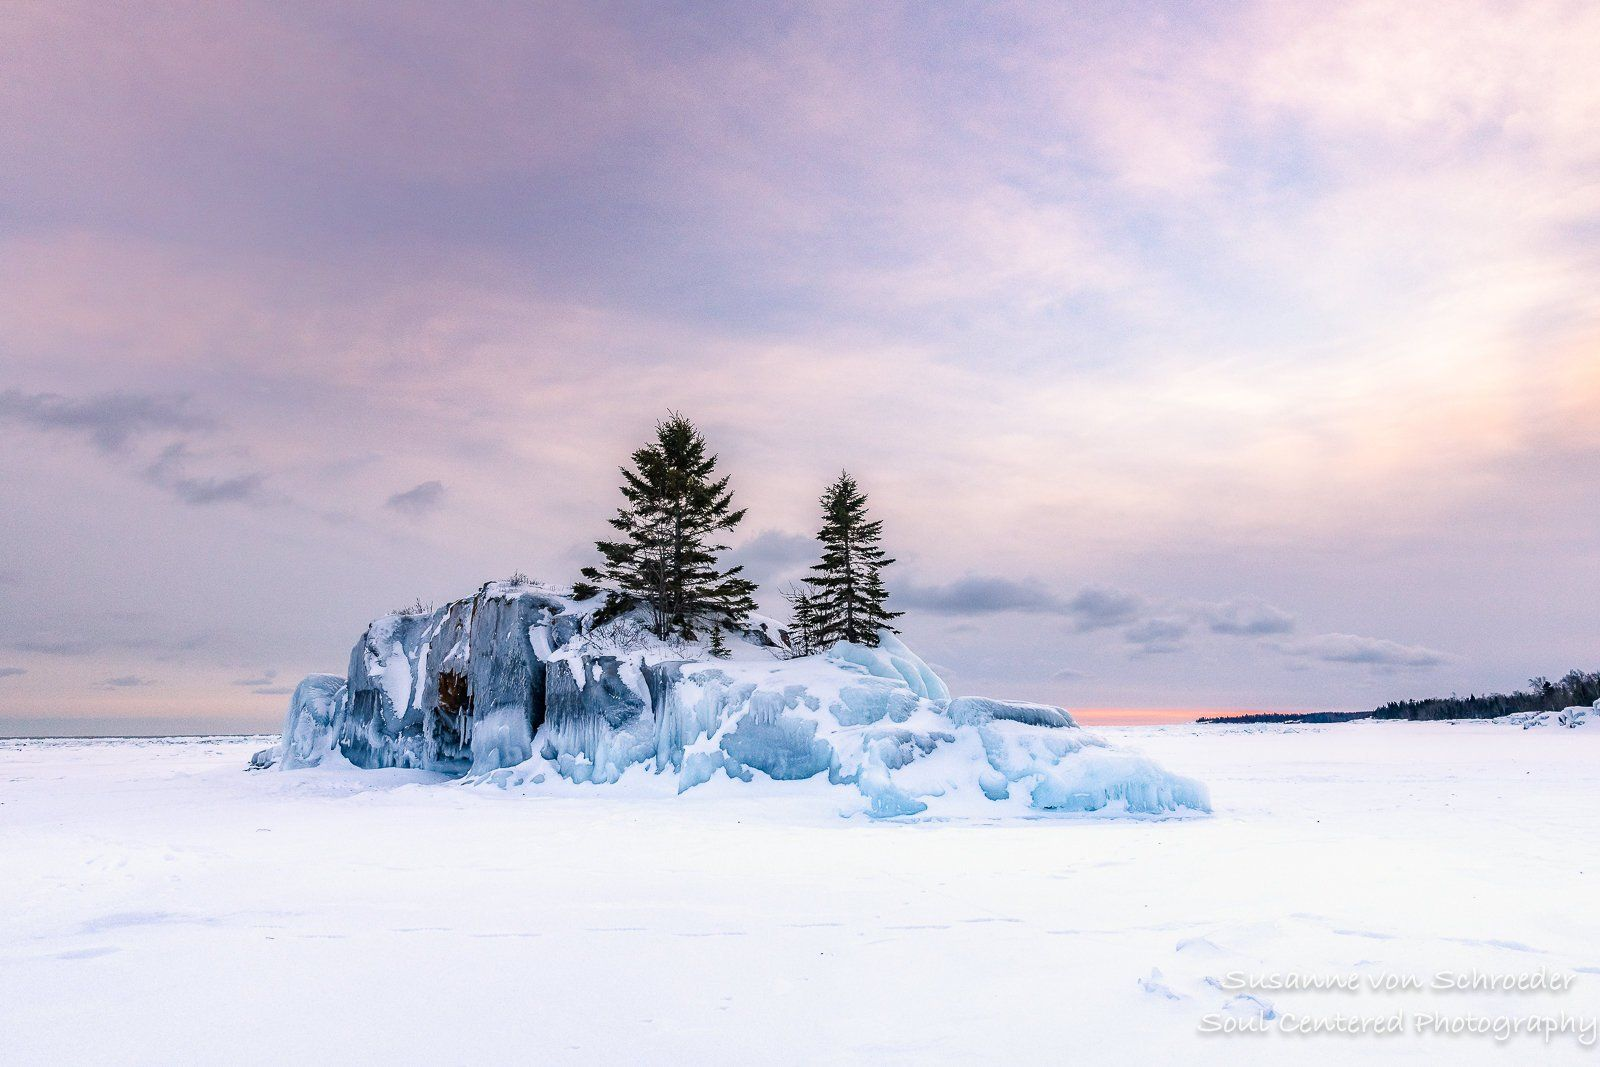 Lake Superior Hollow Rock Winter Sunset Landscape Photography Pastel Colors North Shore Minnesota Peaceful Healing Art Blue Hour Winter Sunset Lake Superior North Shore Minnesota